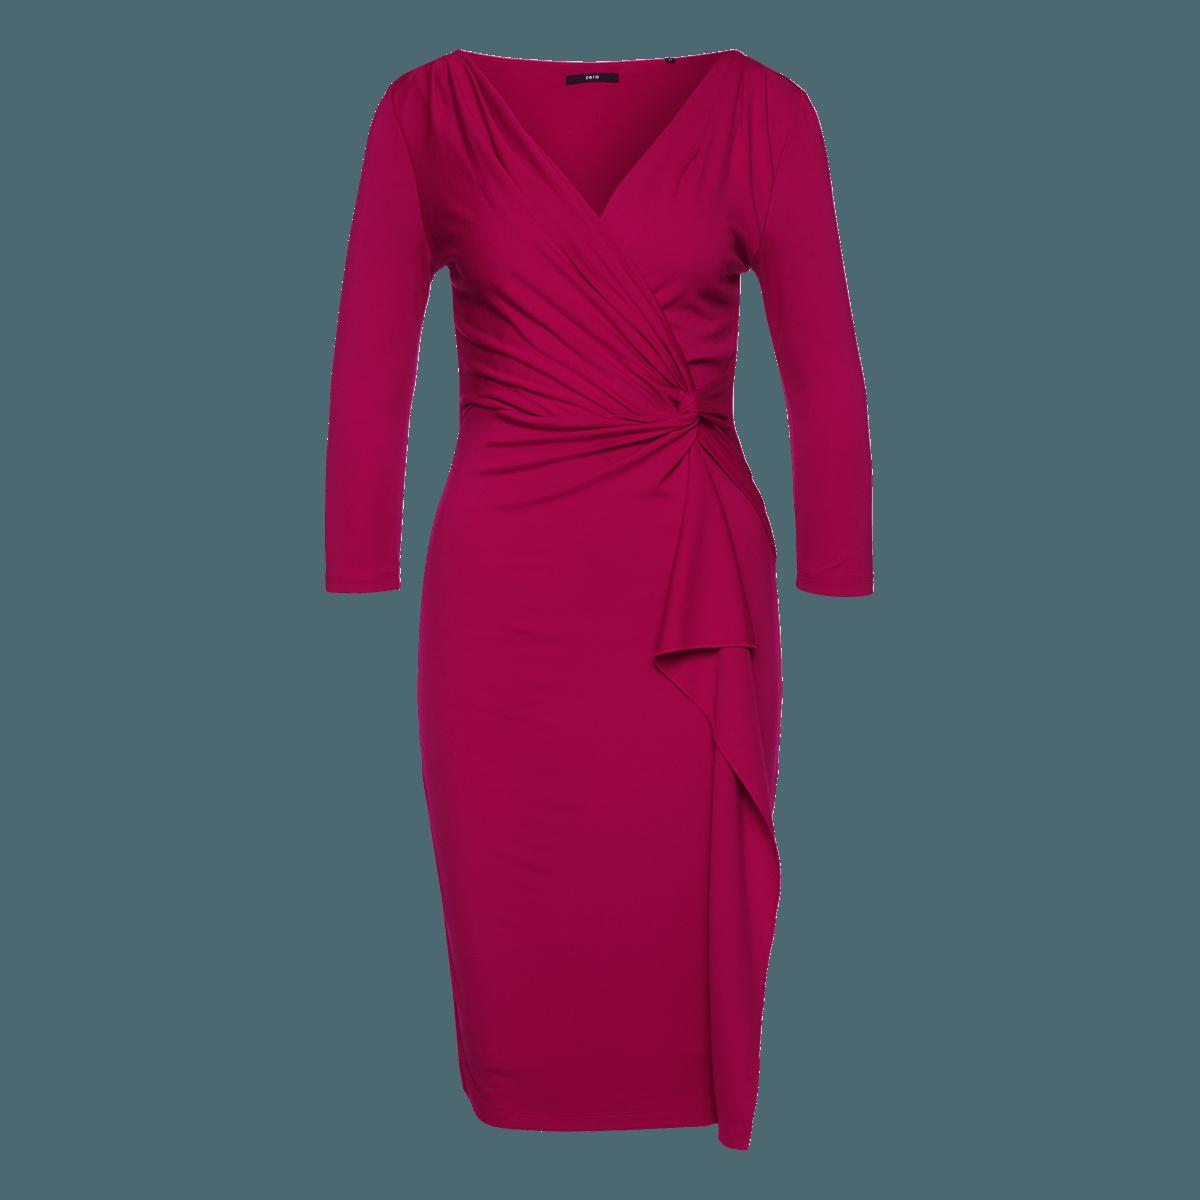 Jersey-Kleid mit formgebender Raffung in pink